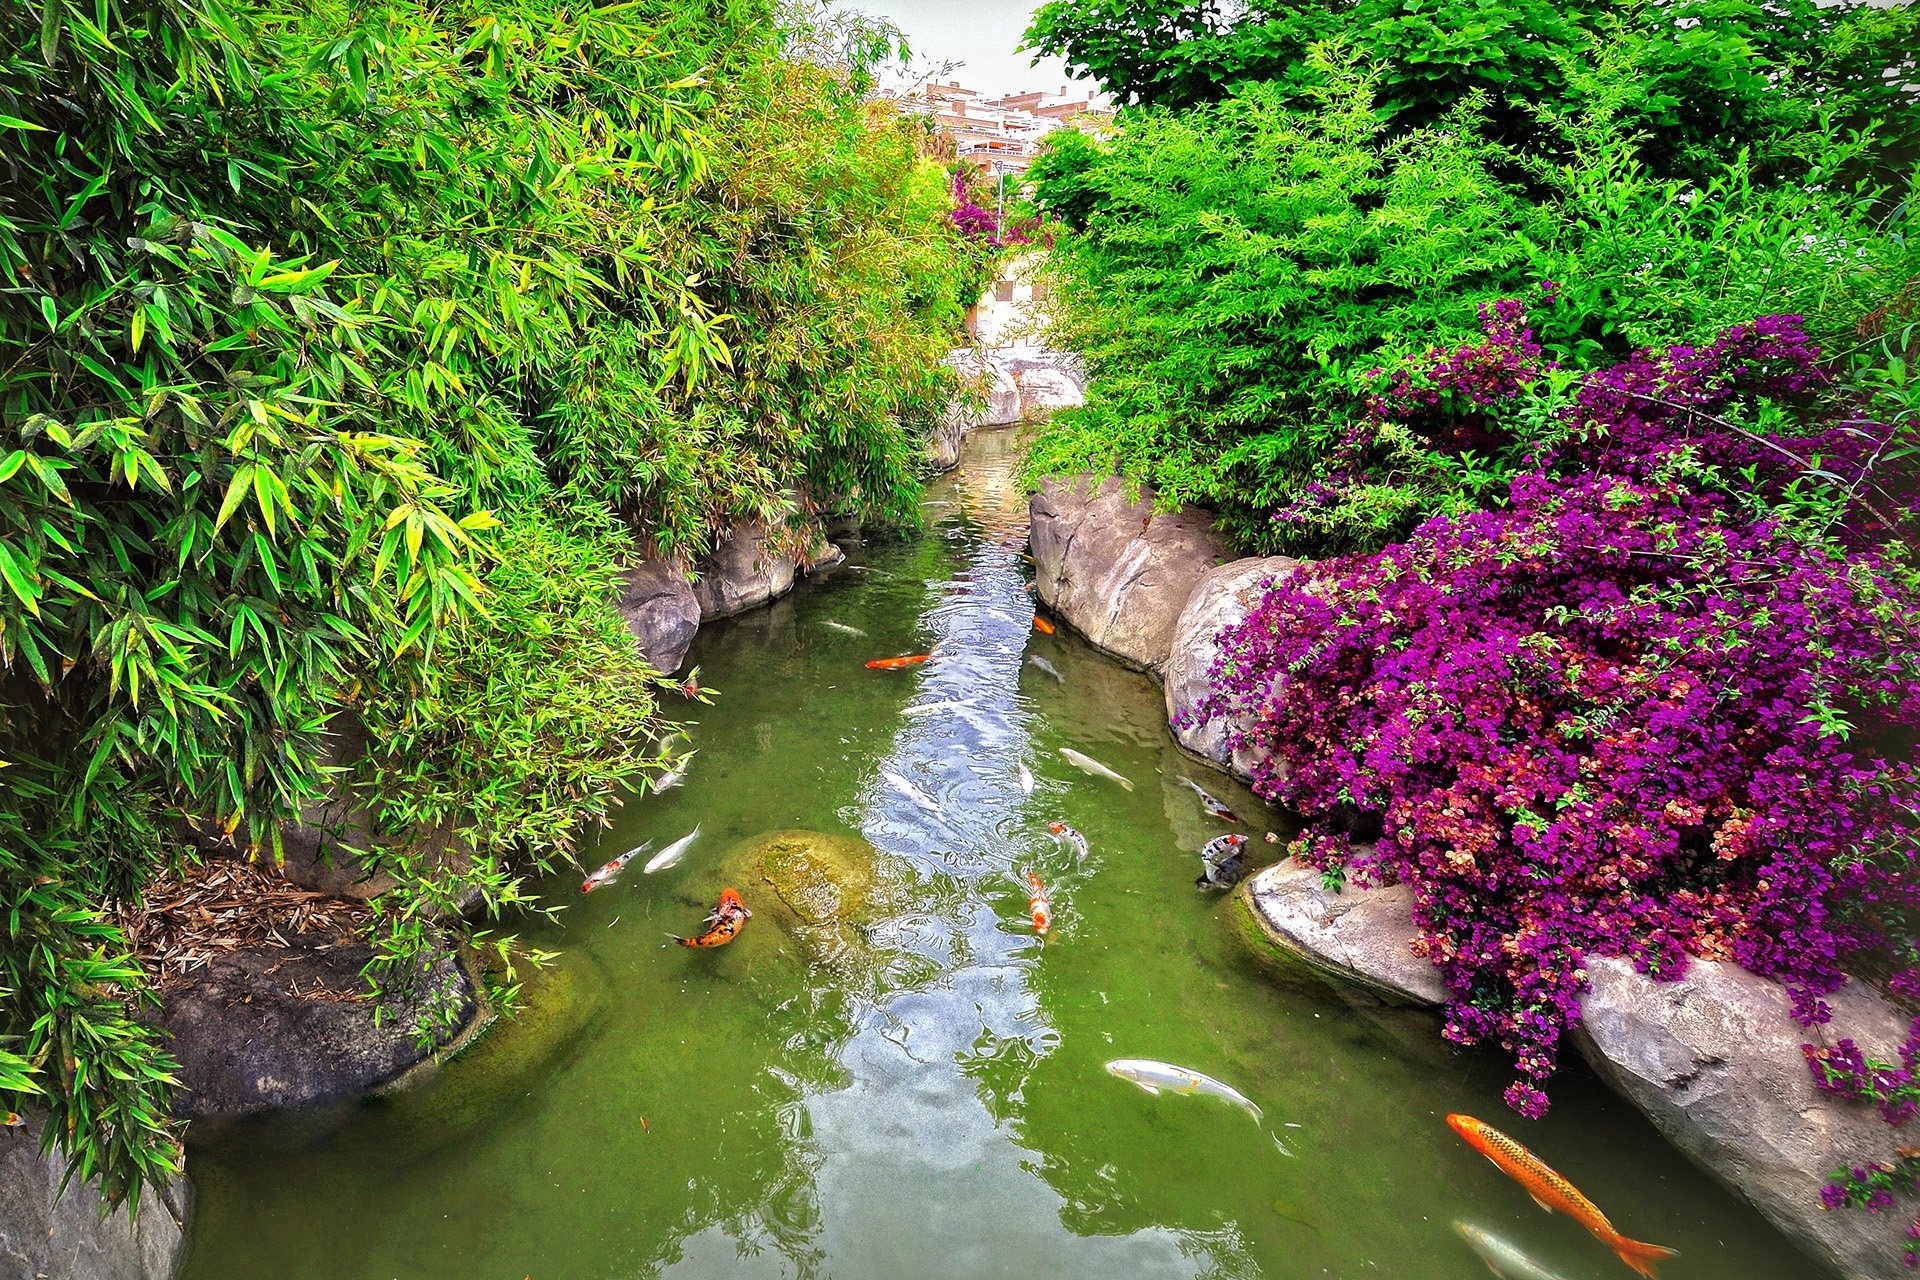 bahçe havuzu